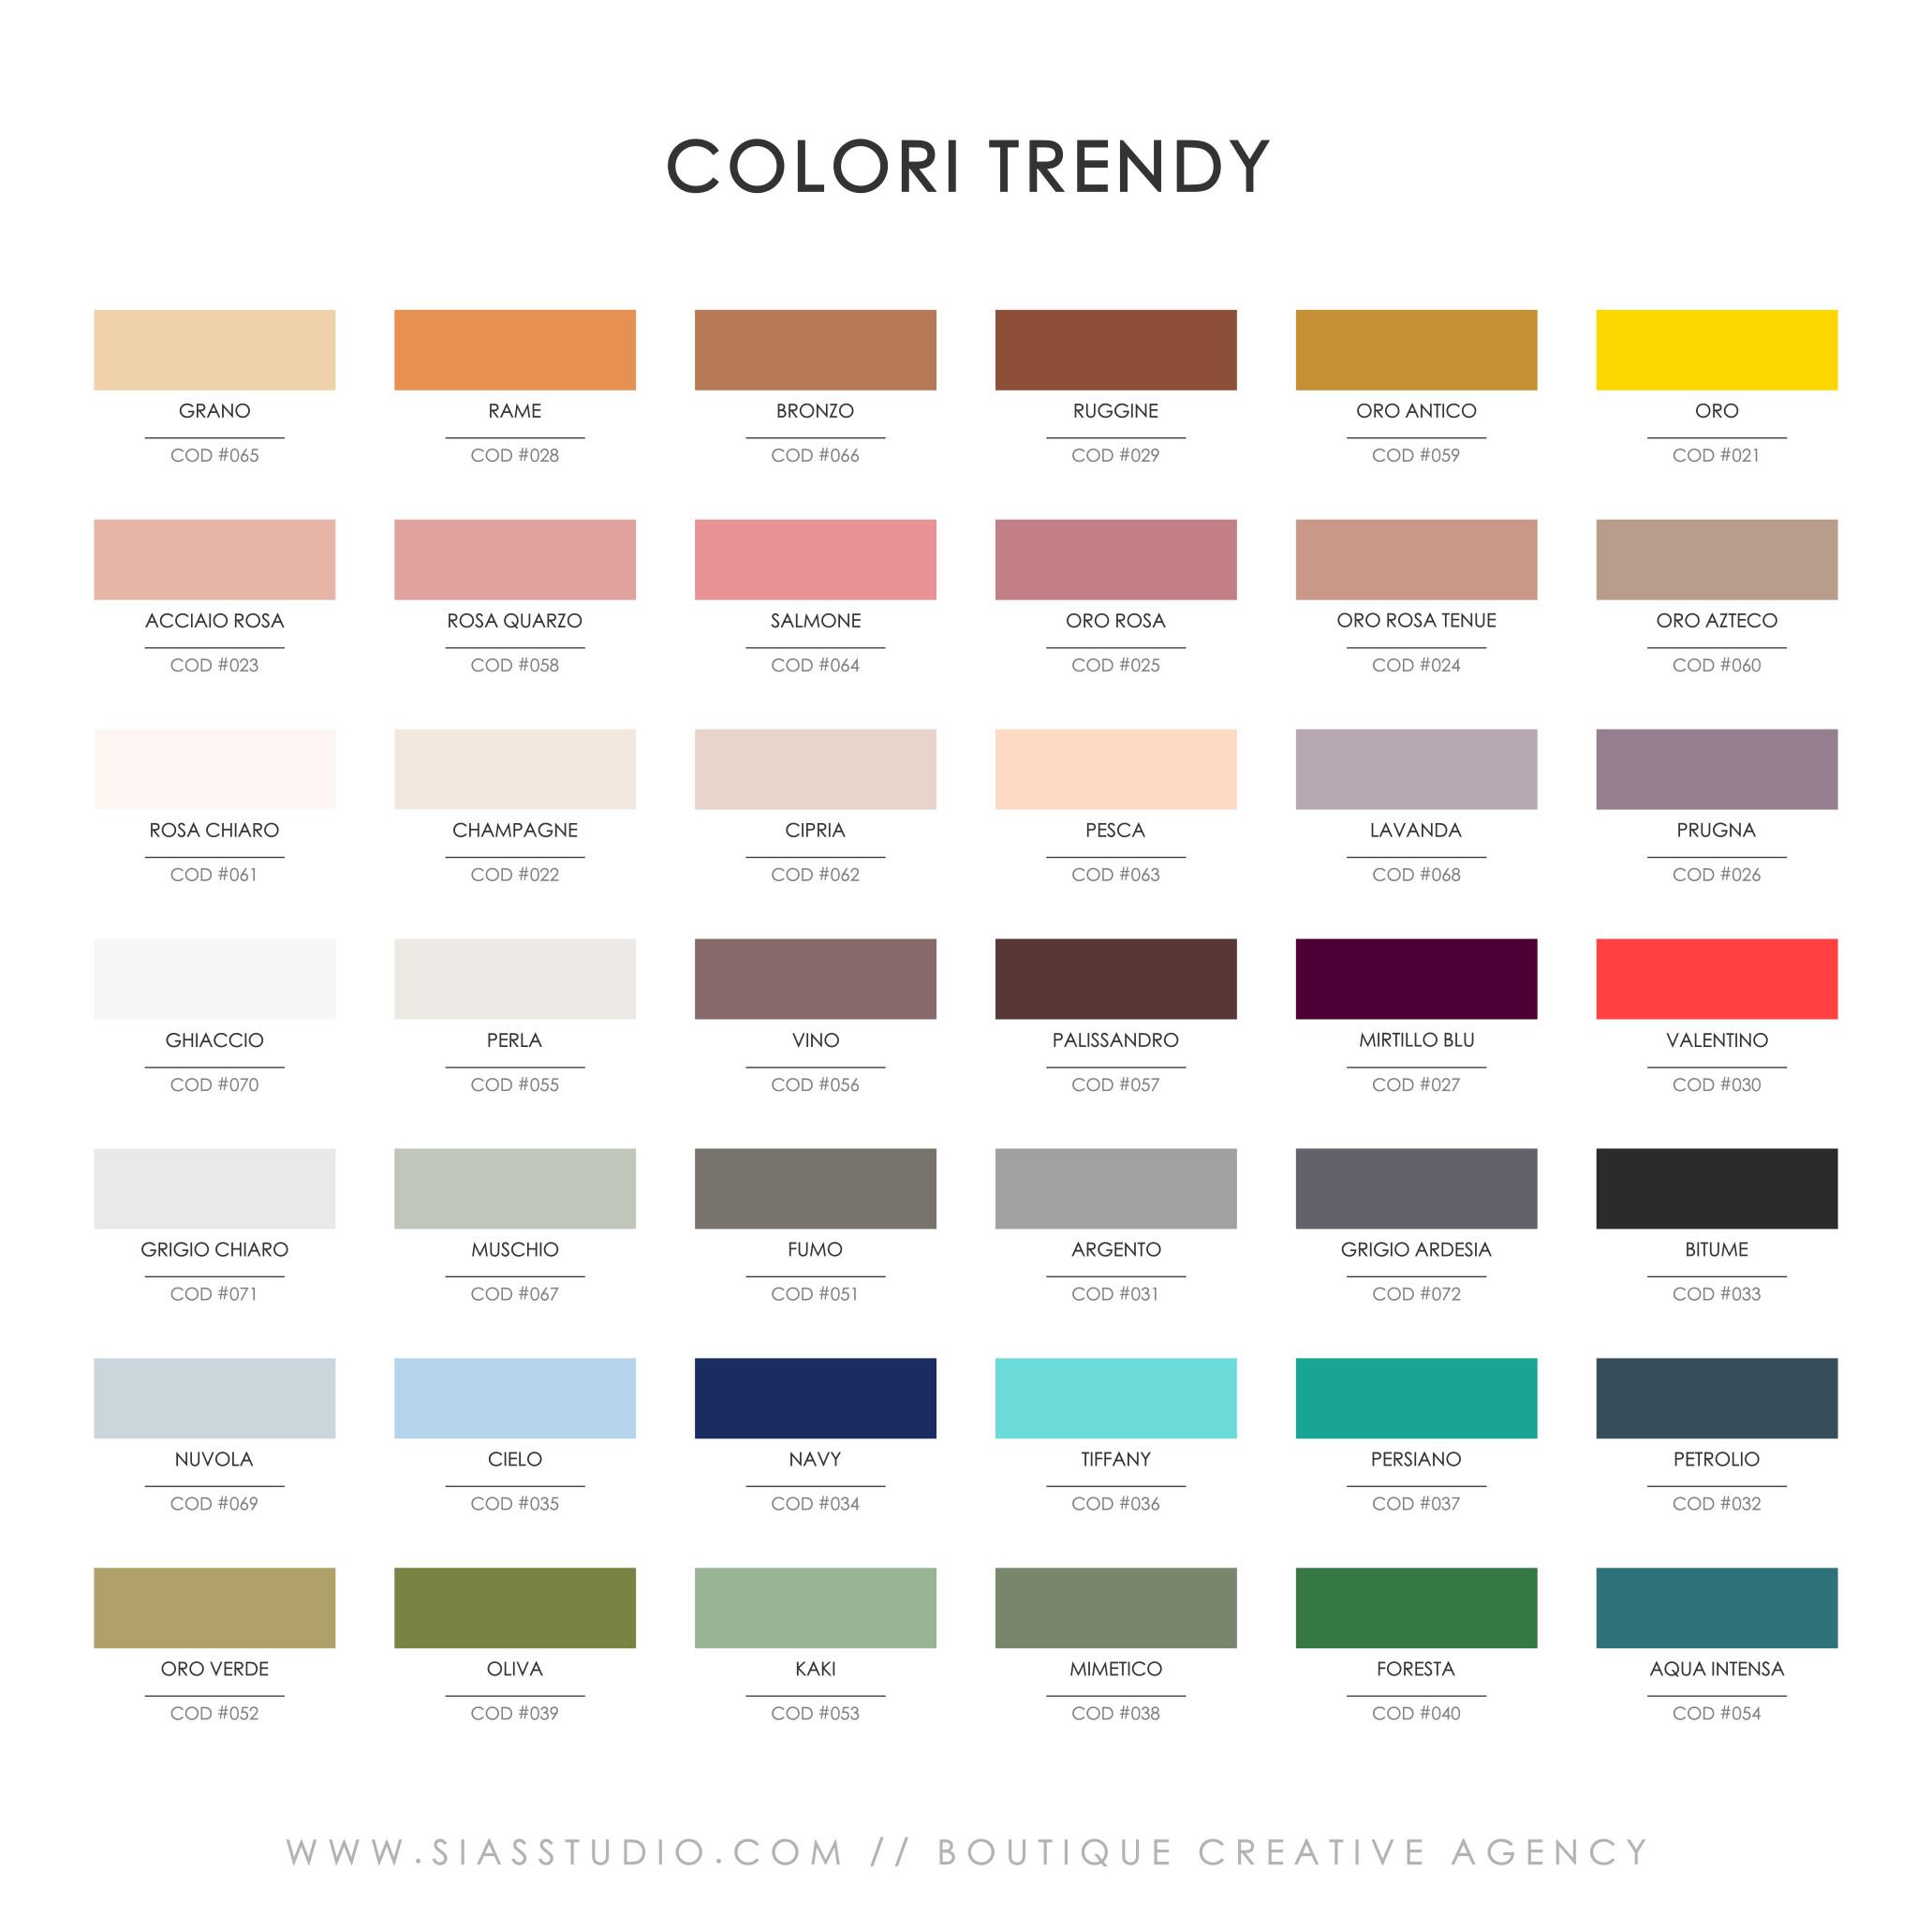 Sias Studio - Colori Trendy